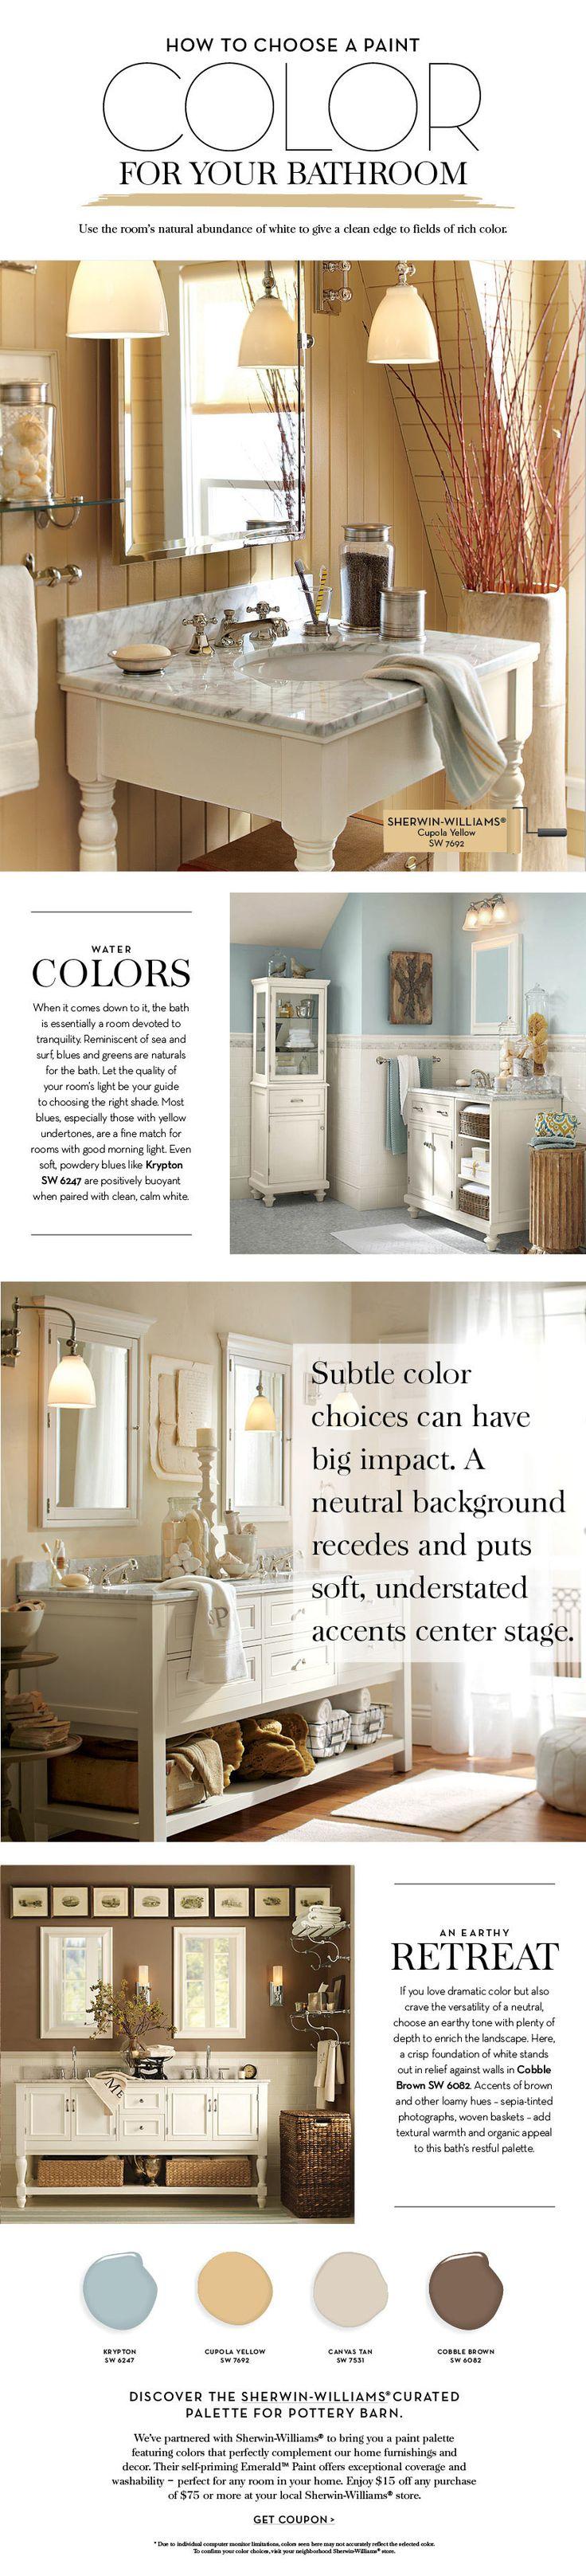 Pottery barn bathroom paint colors - Choose A Paint Color For Your Bathroom Pottery Barn Love The Color